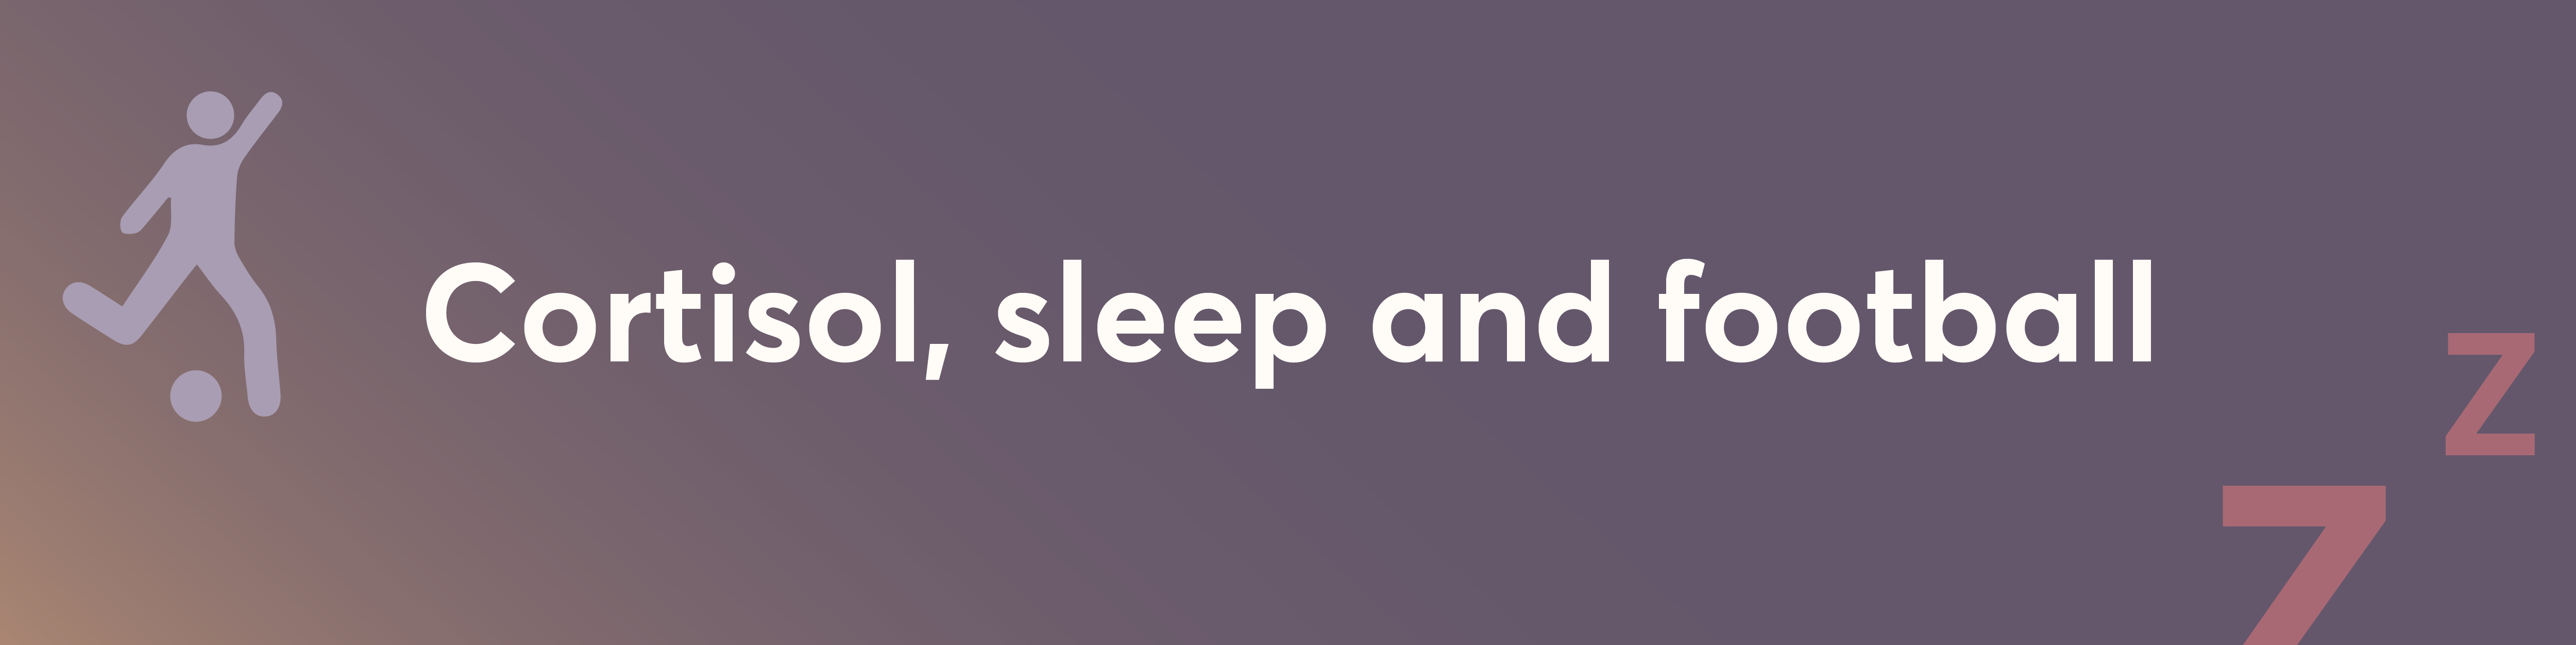 football, stress and sleep